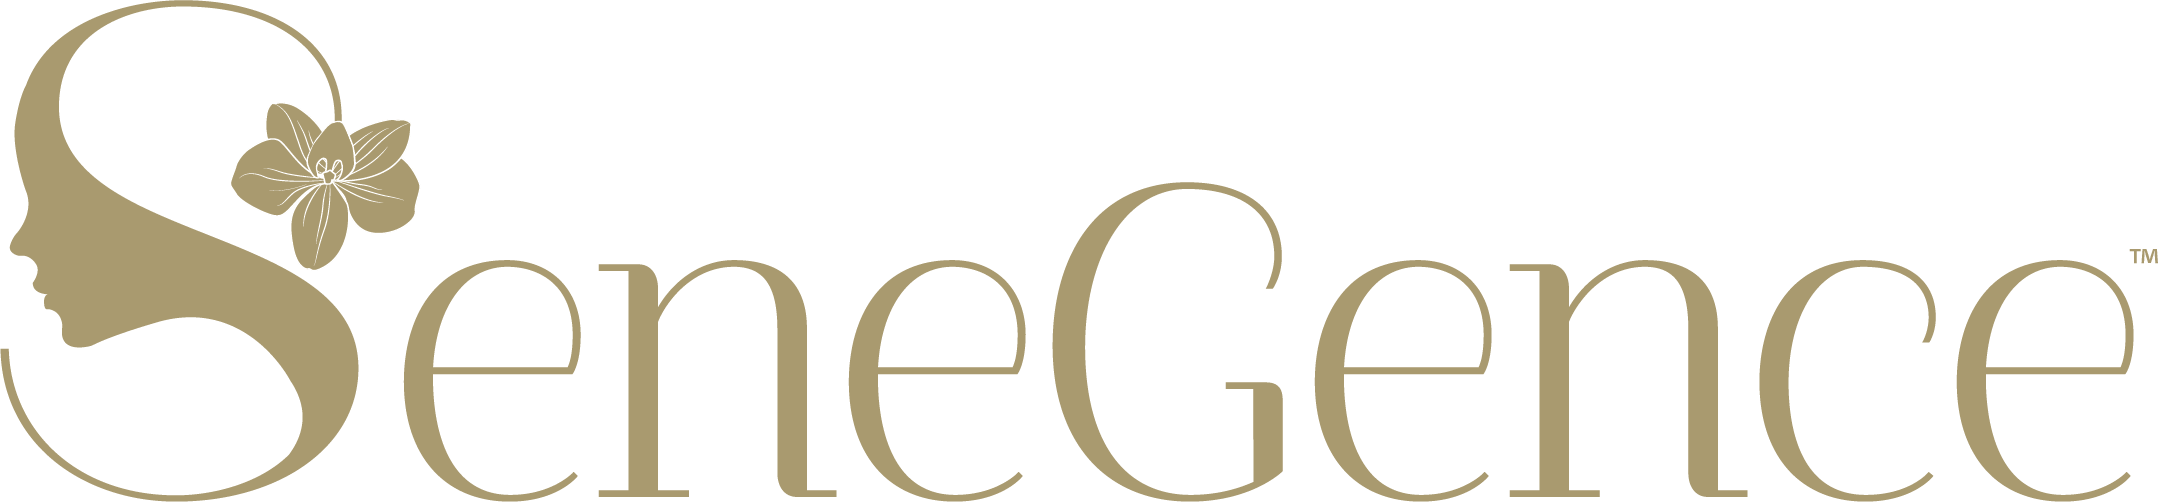 Senegence_gold